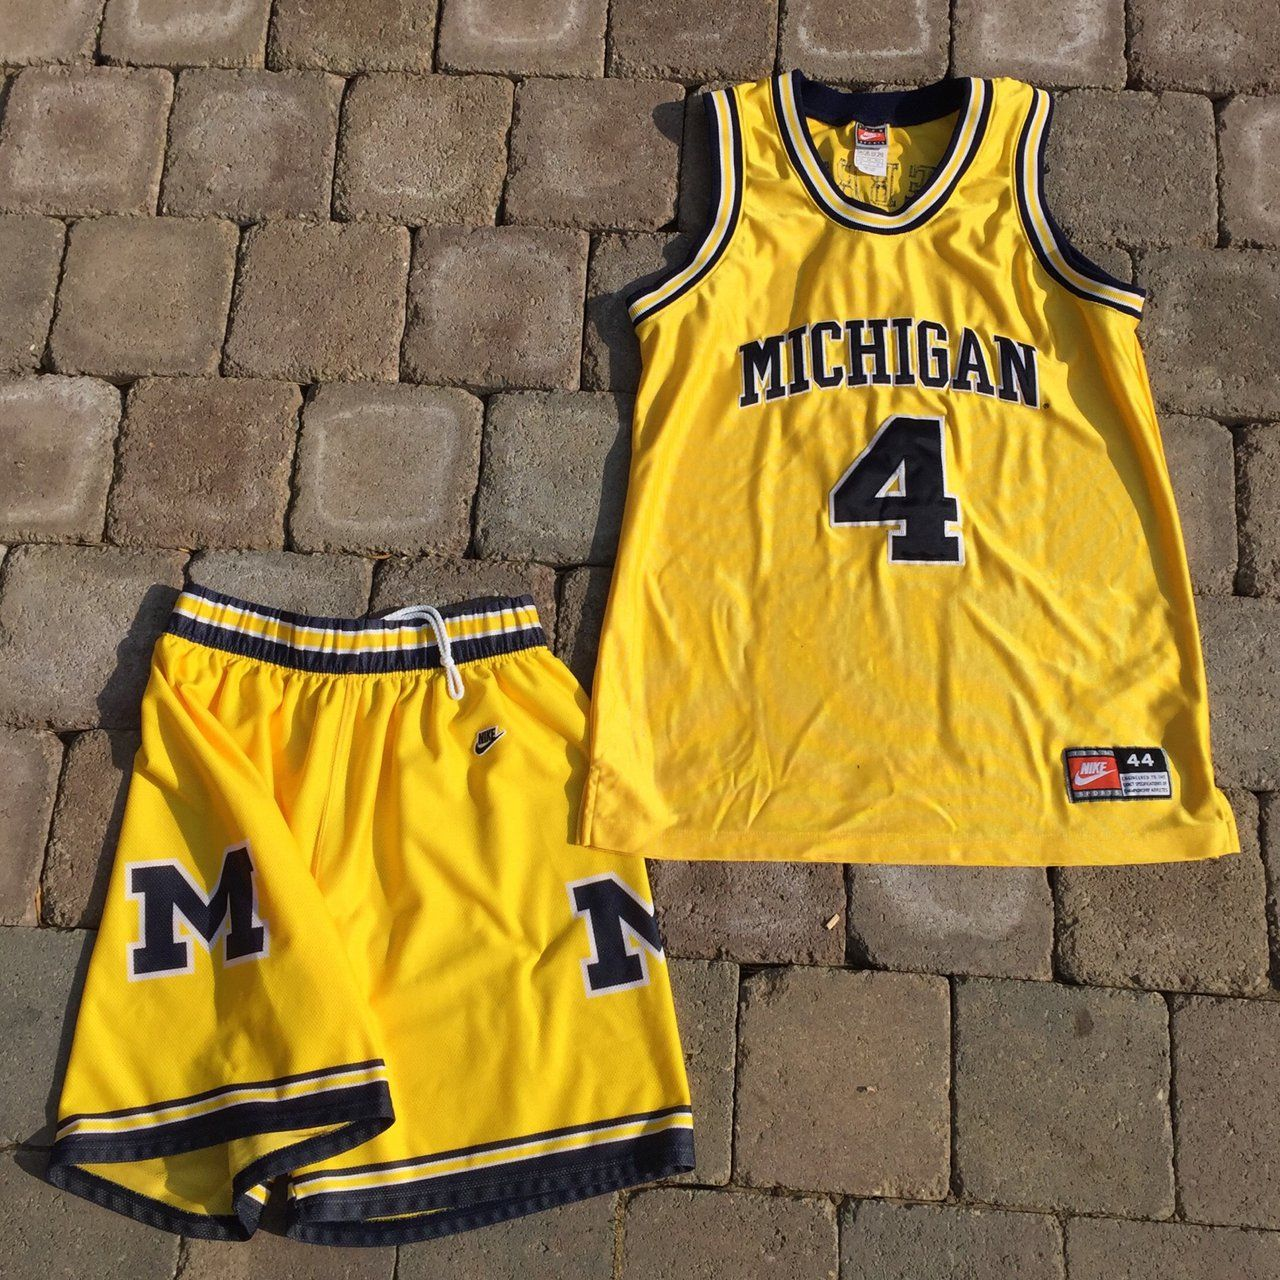 Insane Vintage Nike Chris Webber 4 Michigan Jersey Matching Men S Large Vintage University Of Michigan Shorts Vintage Sportswear Vintage Nike Chris Webber